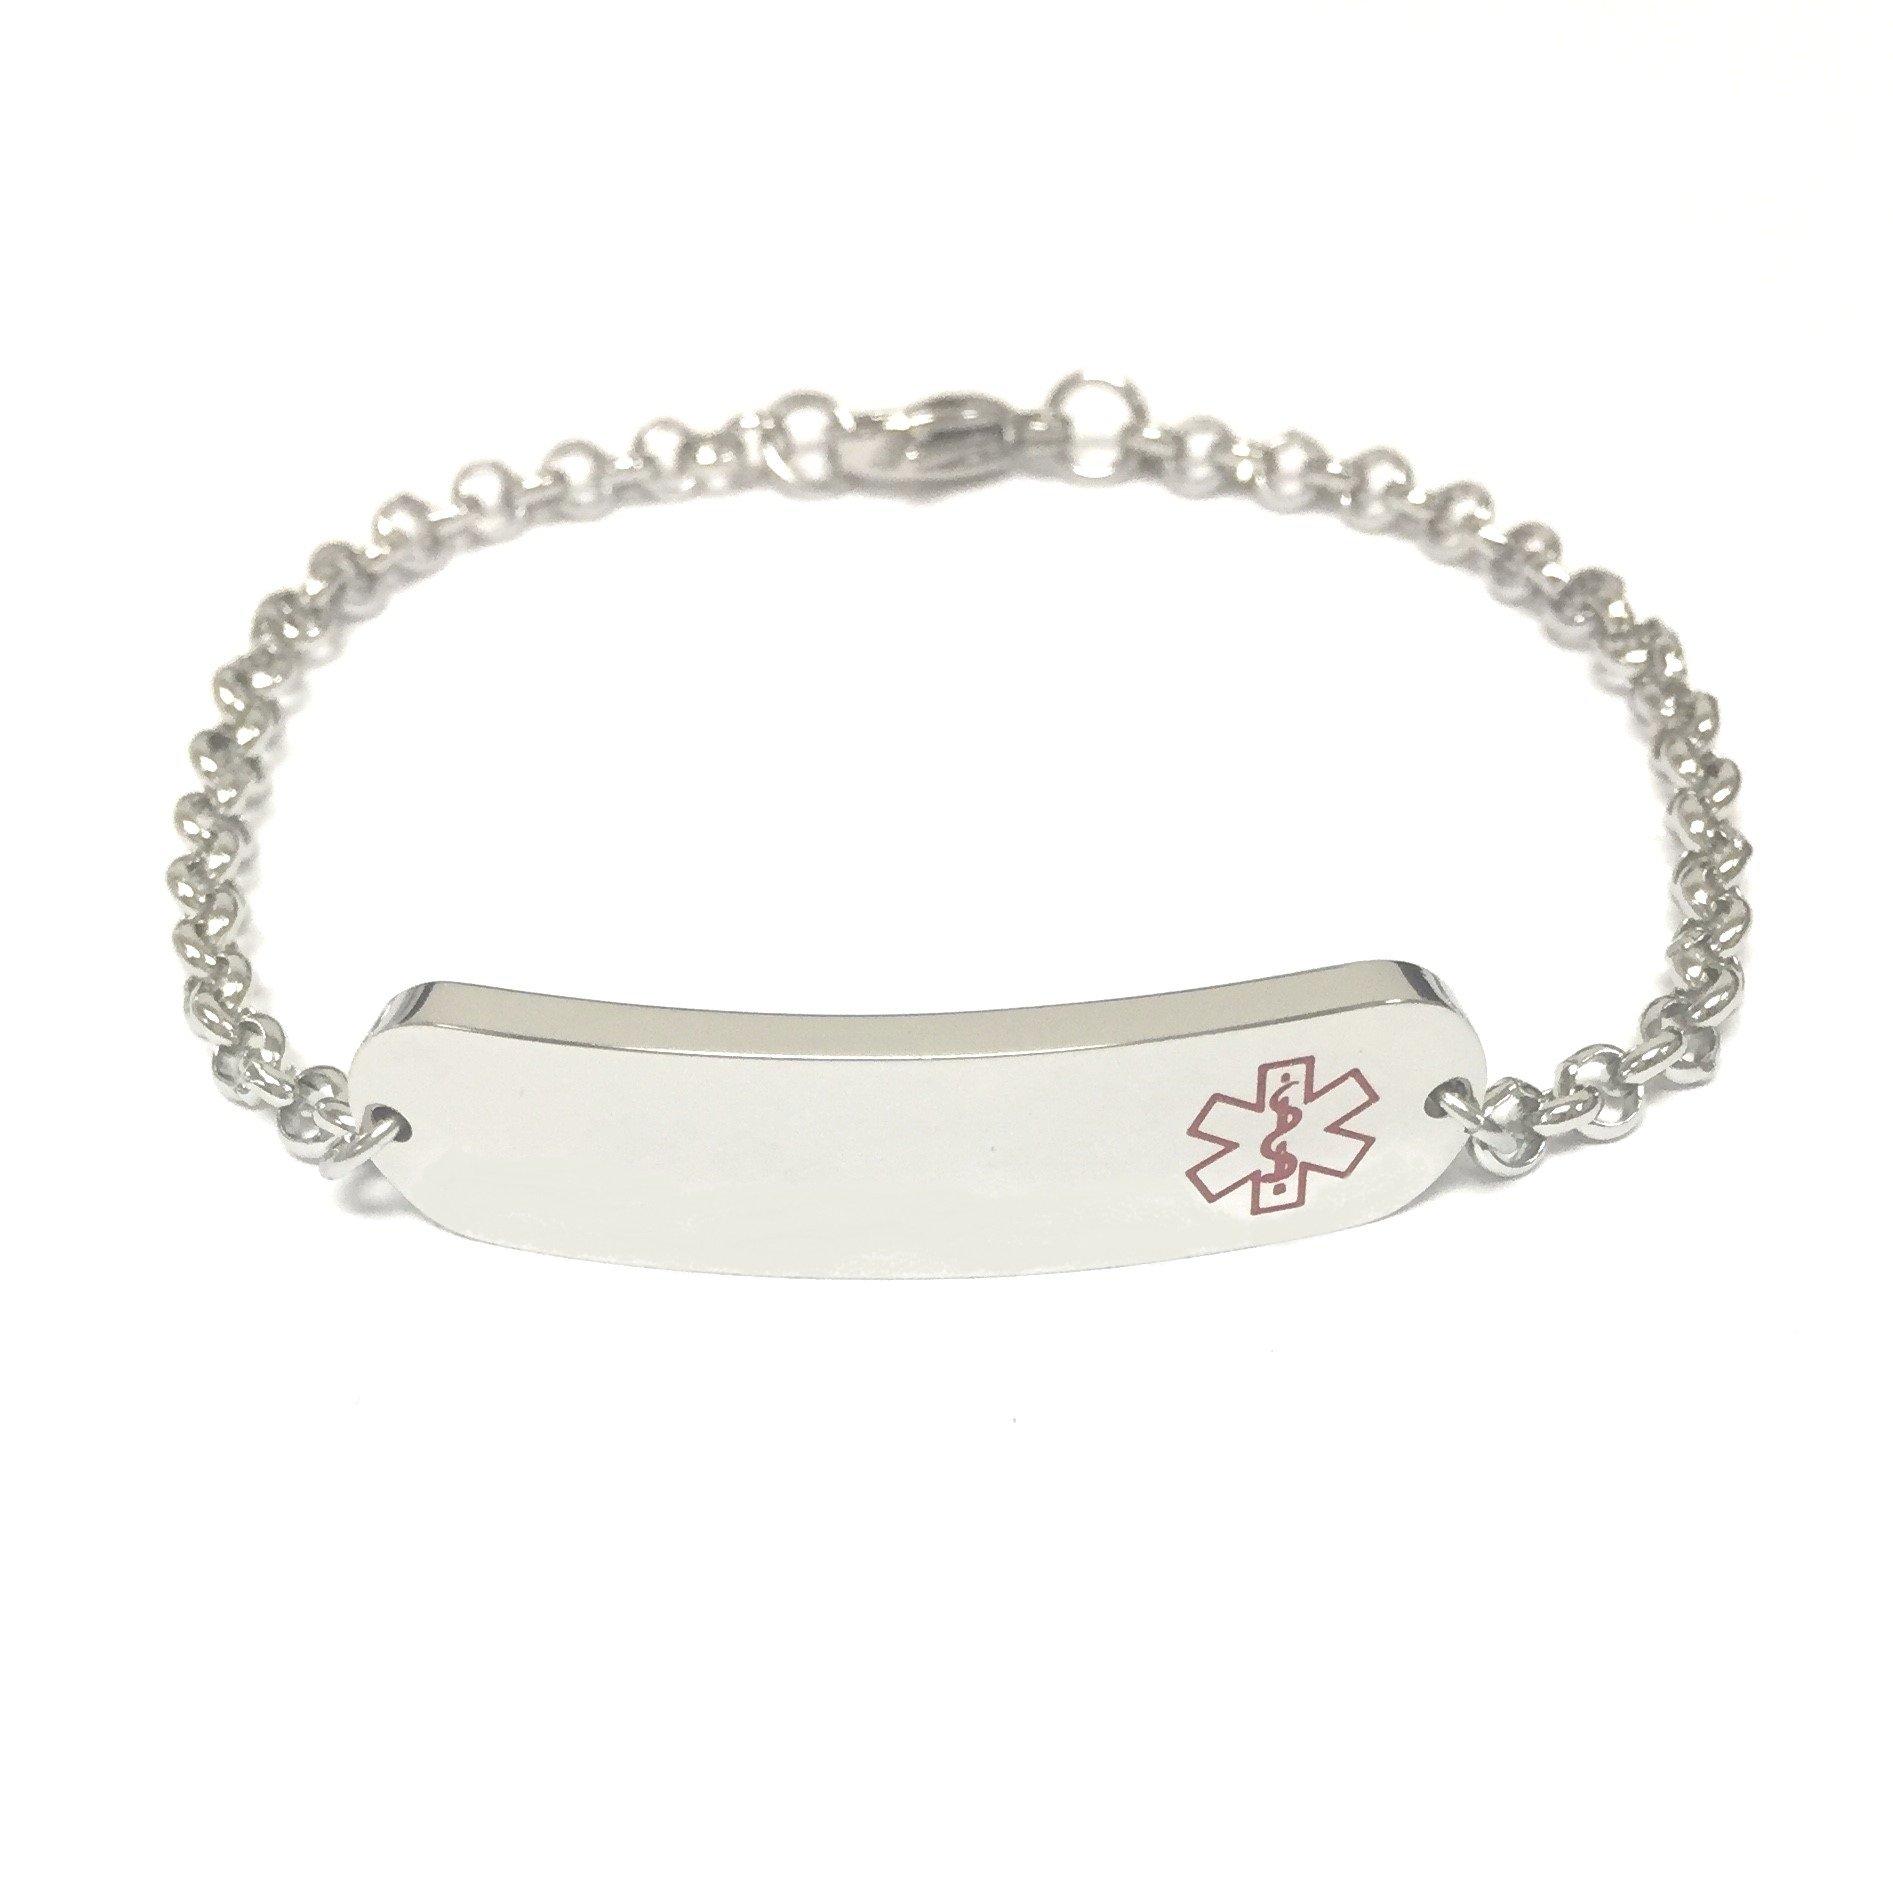 TravelJewelry.com Stainless Steel Medical Bracelet